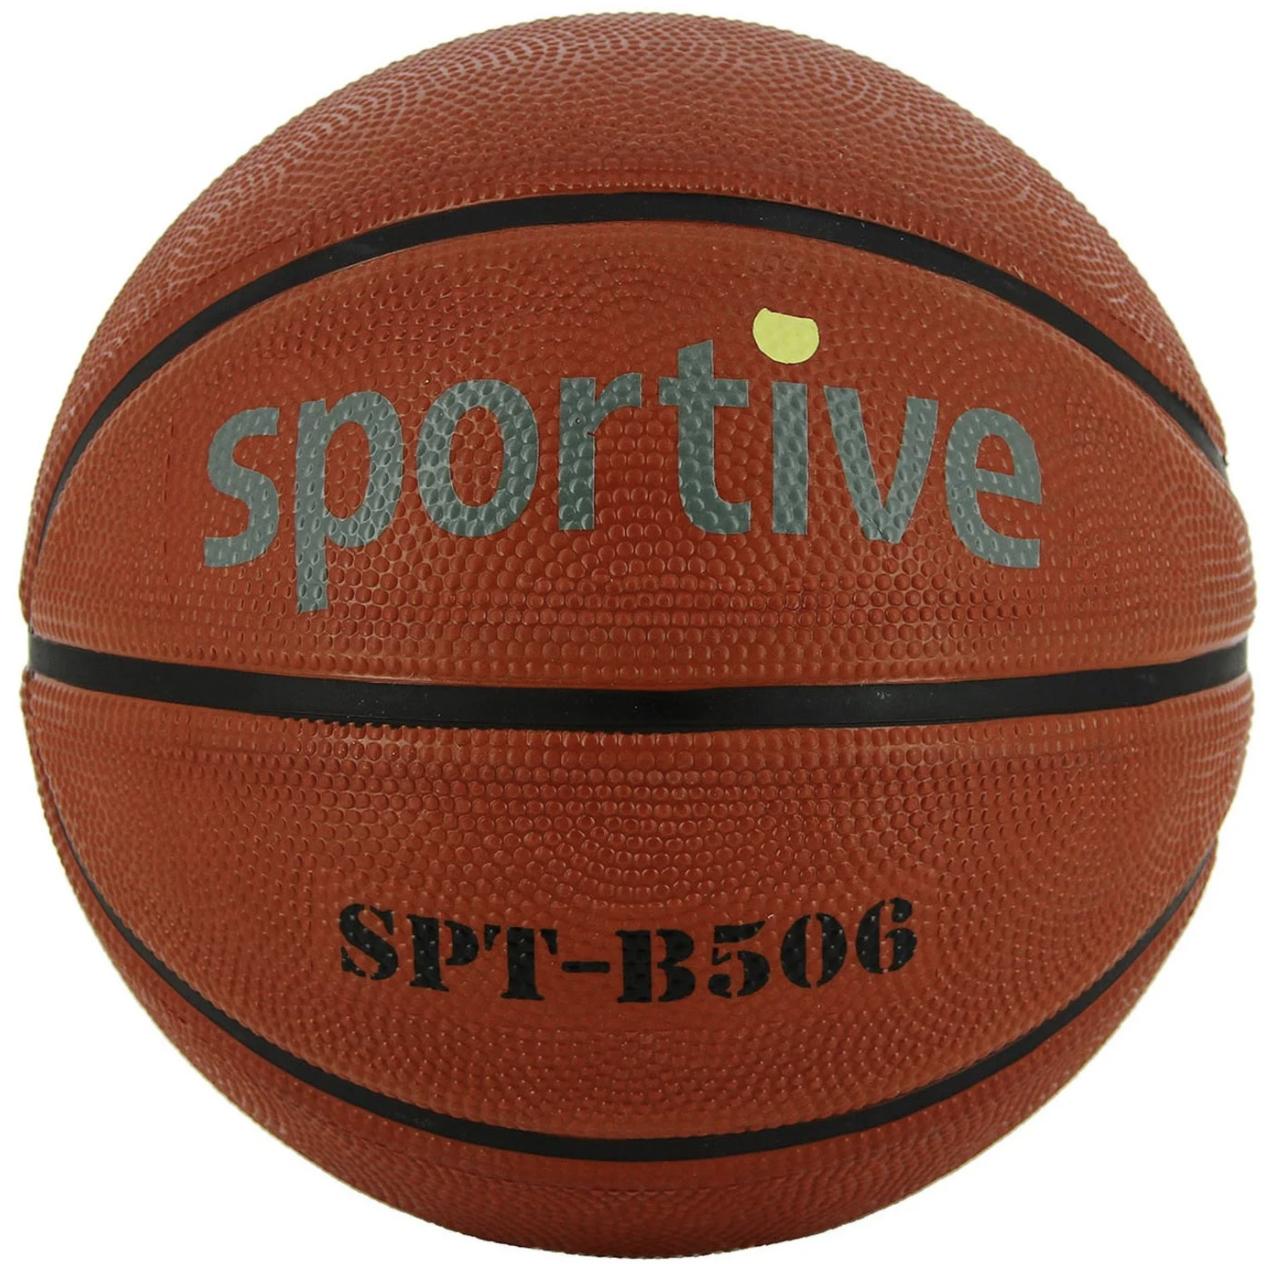 Sportive Bounce Turuncu Basketbol Topu SPT-B506